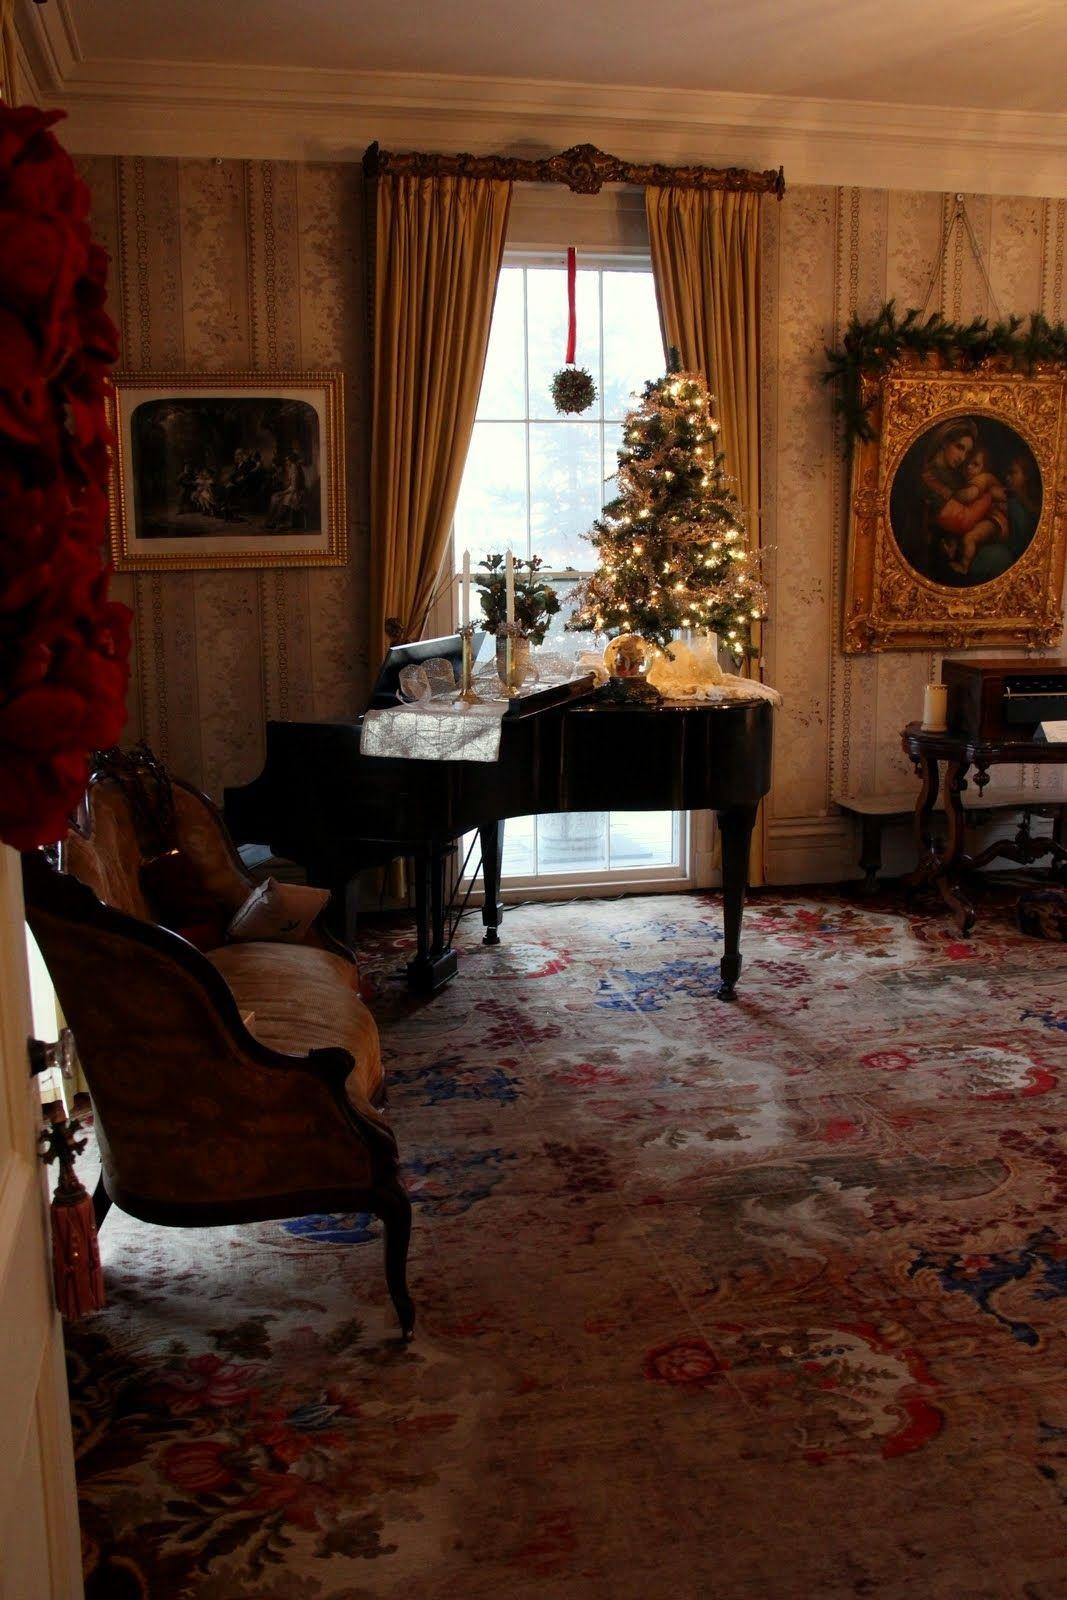 Aiken House & Gardens: The White Columns Historic Home